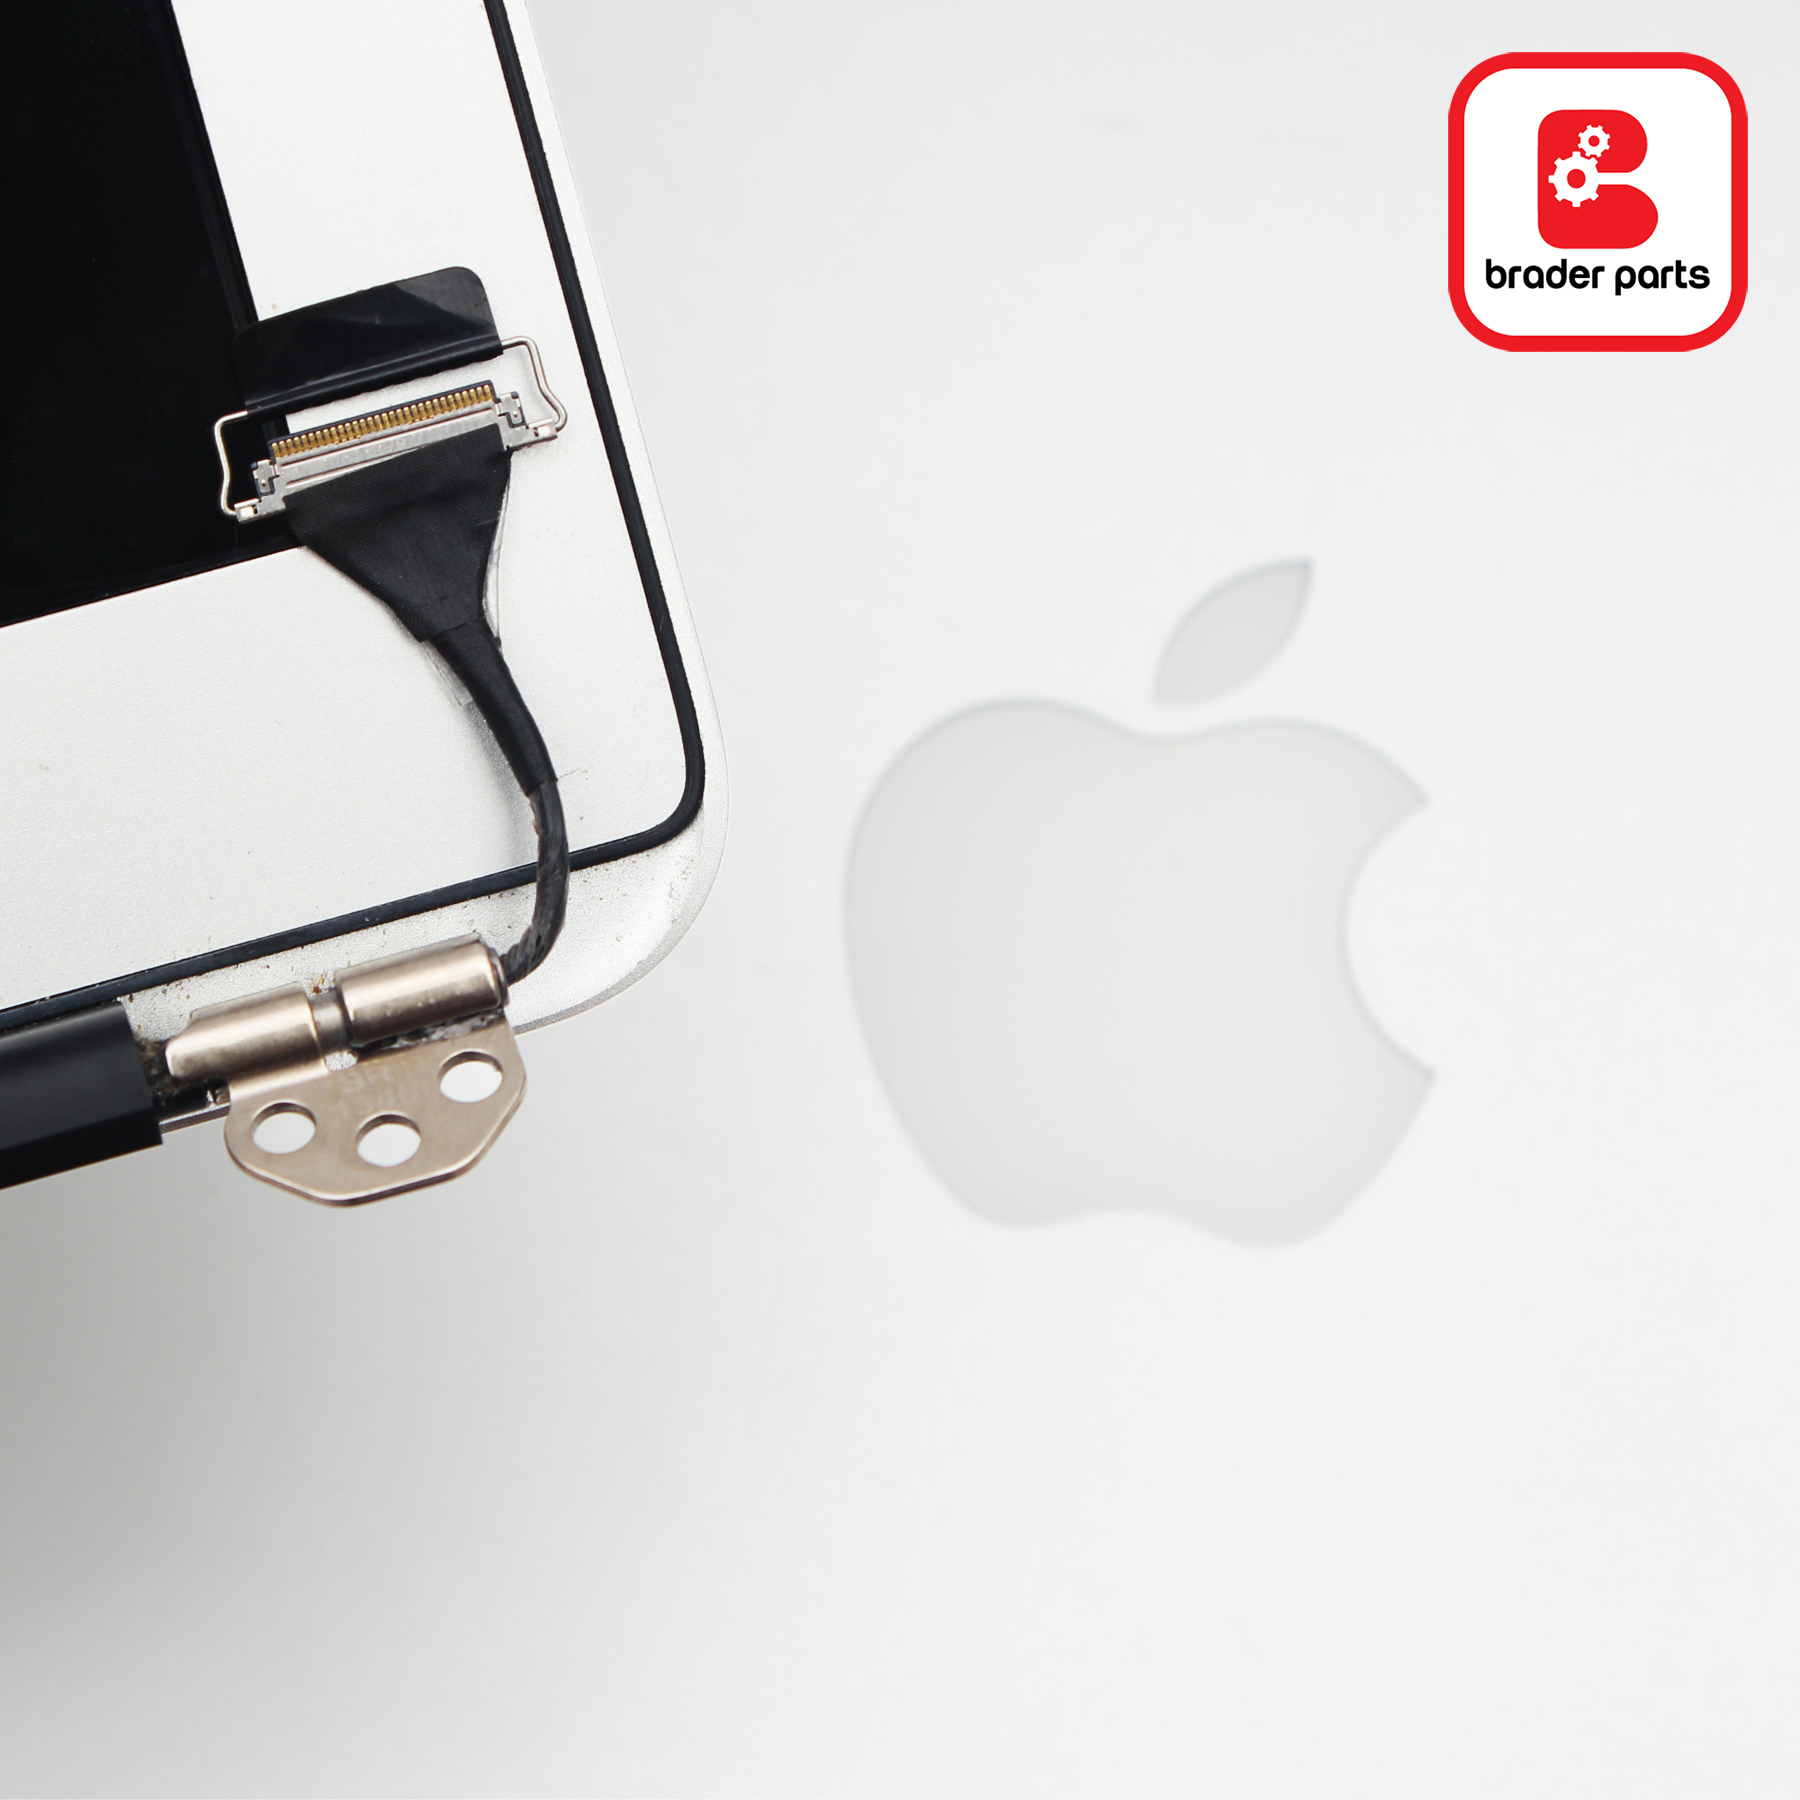 "Lcd Macbook Air 13"" A1369 Late 2010 - Mid 2011 hinge"